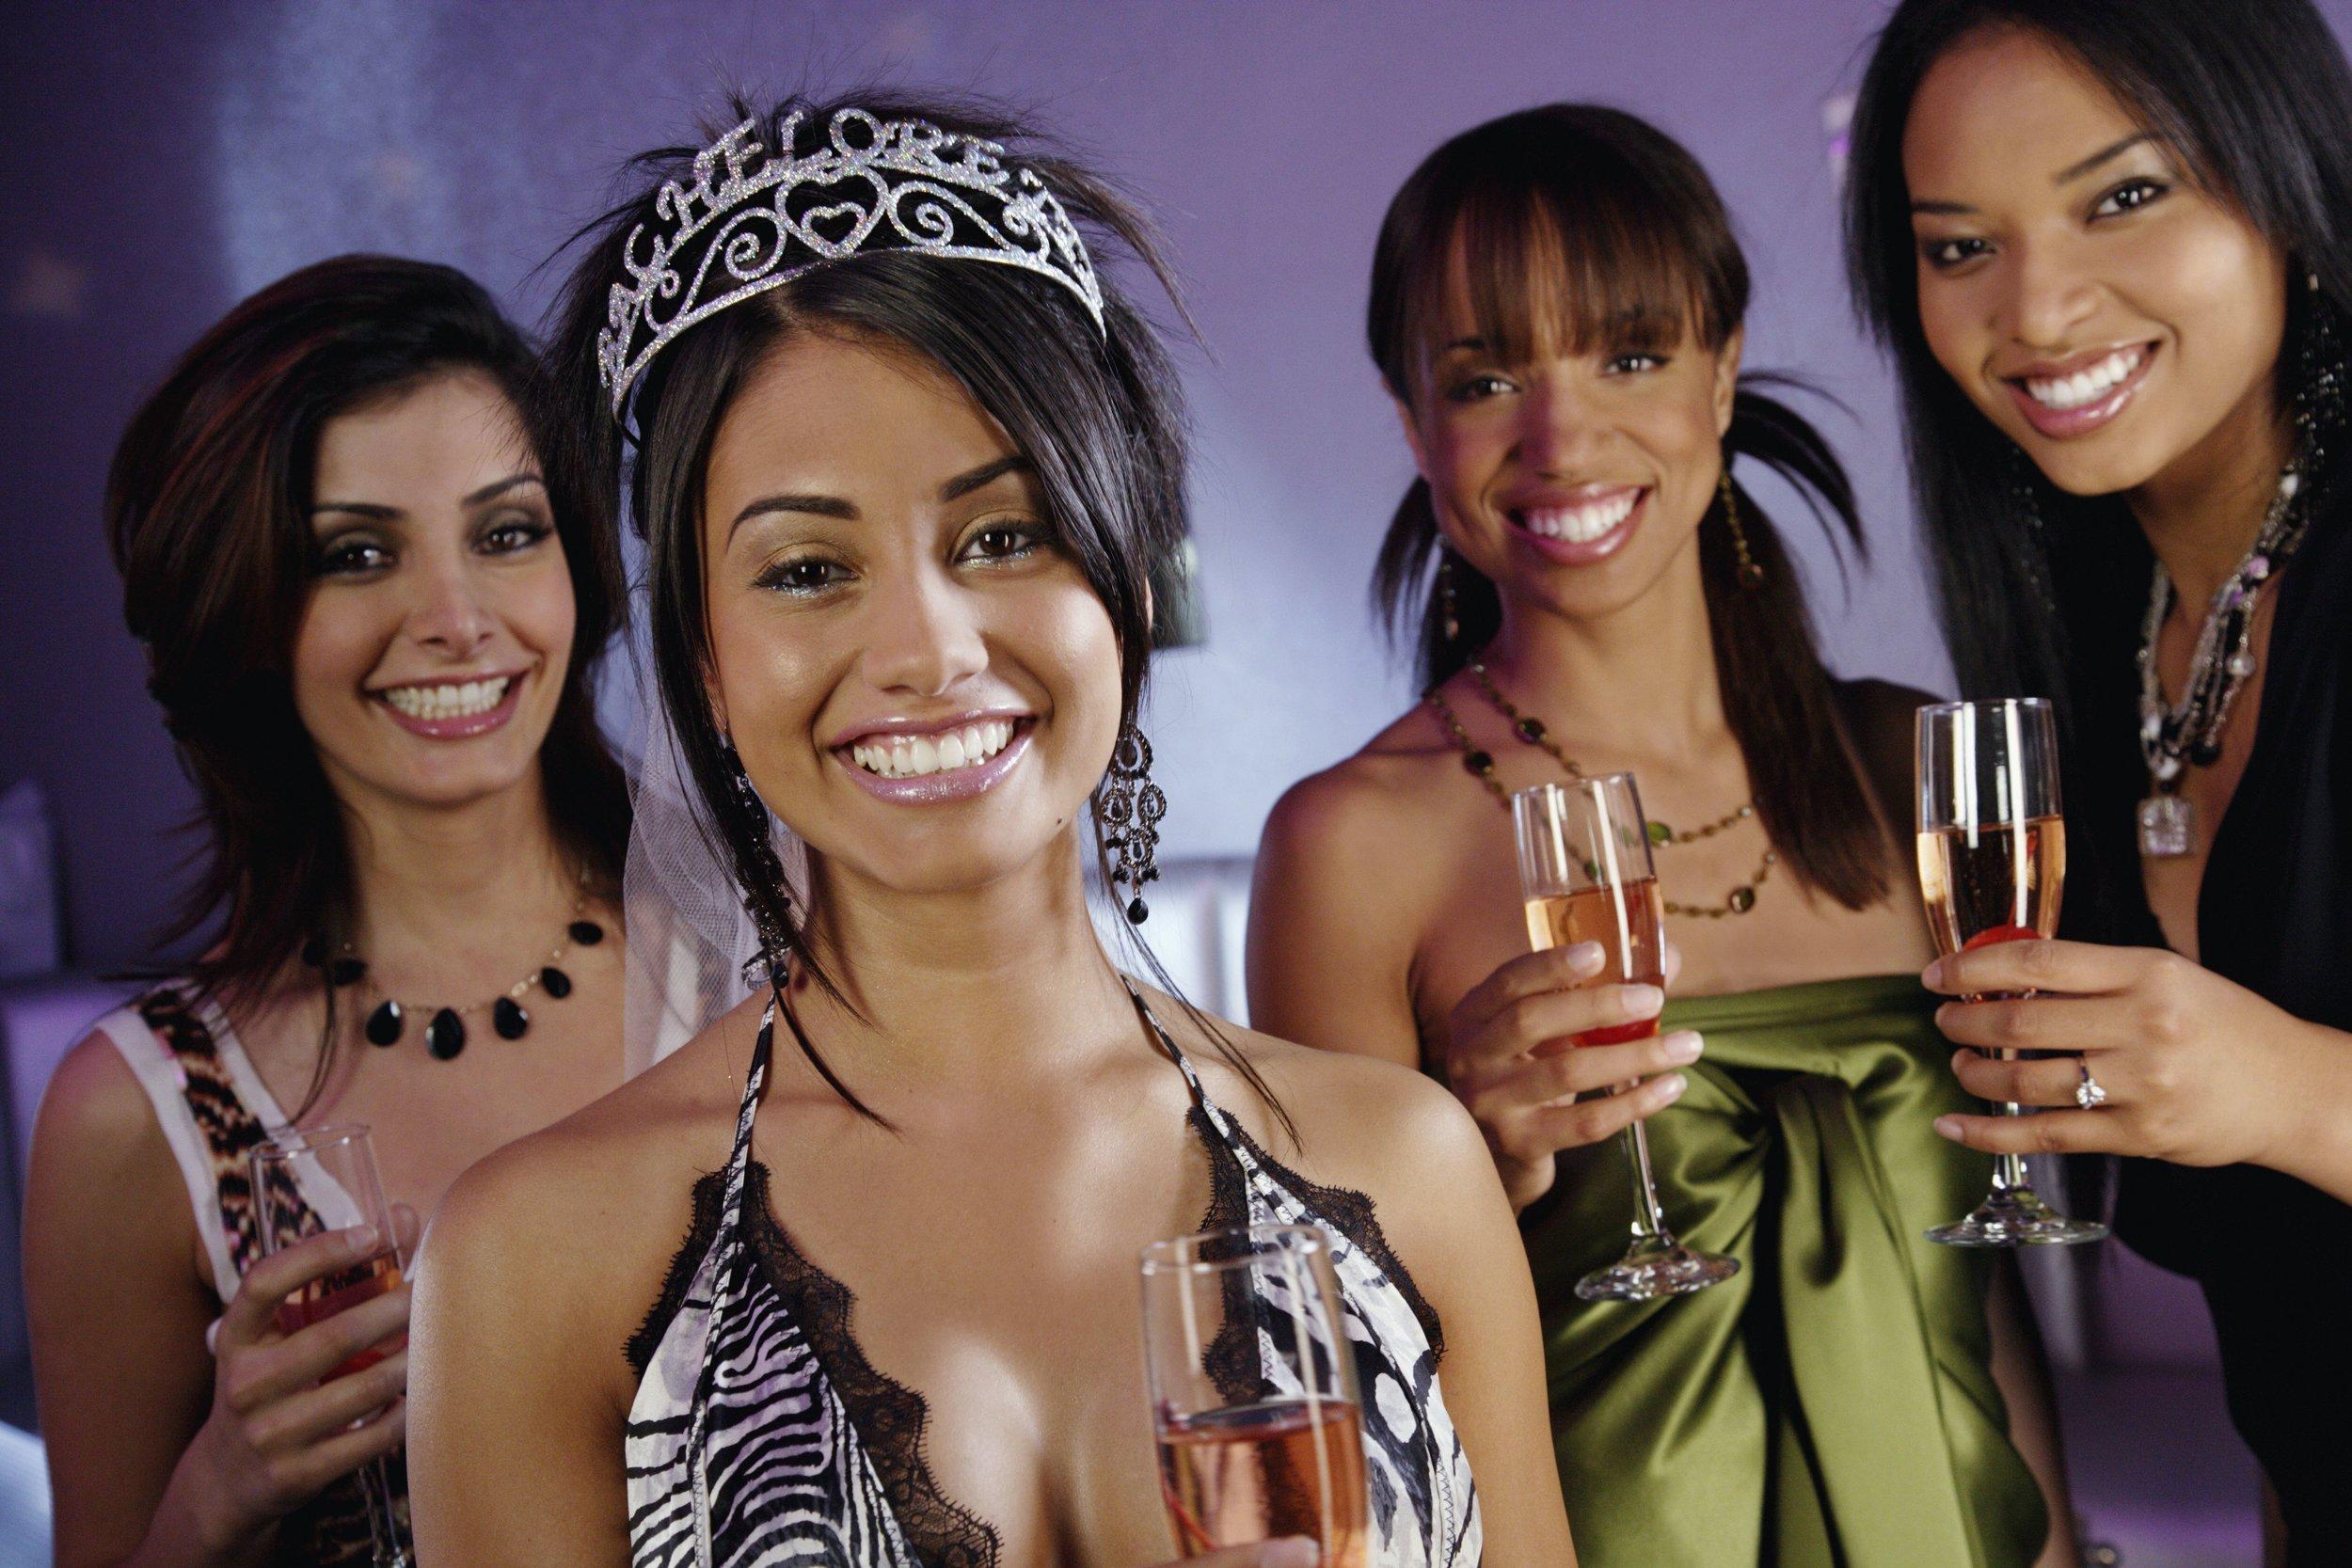 portrait-of-multi-ethnic-women-at-bachelorette-party-74009525-58a480983df78c47587f961a.jpg